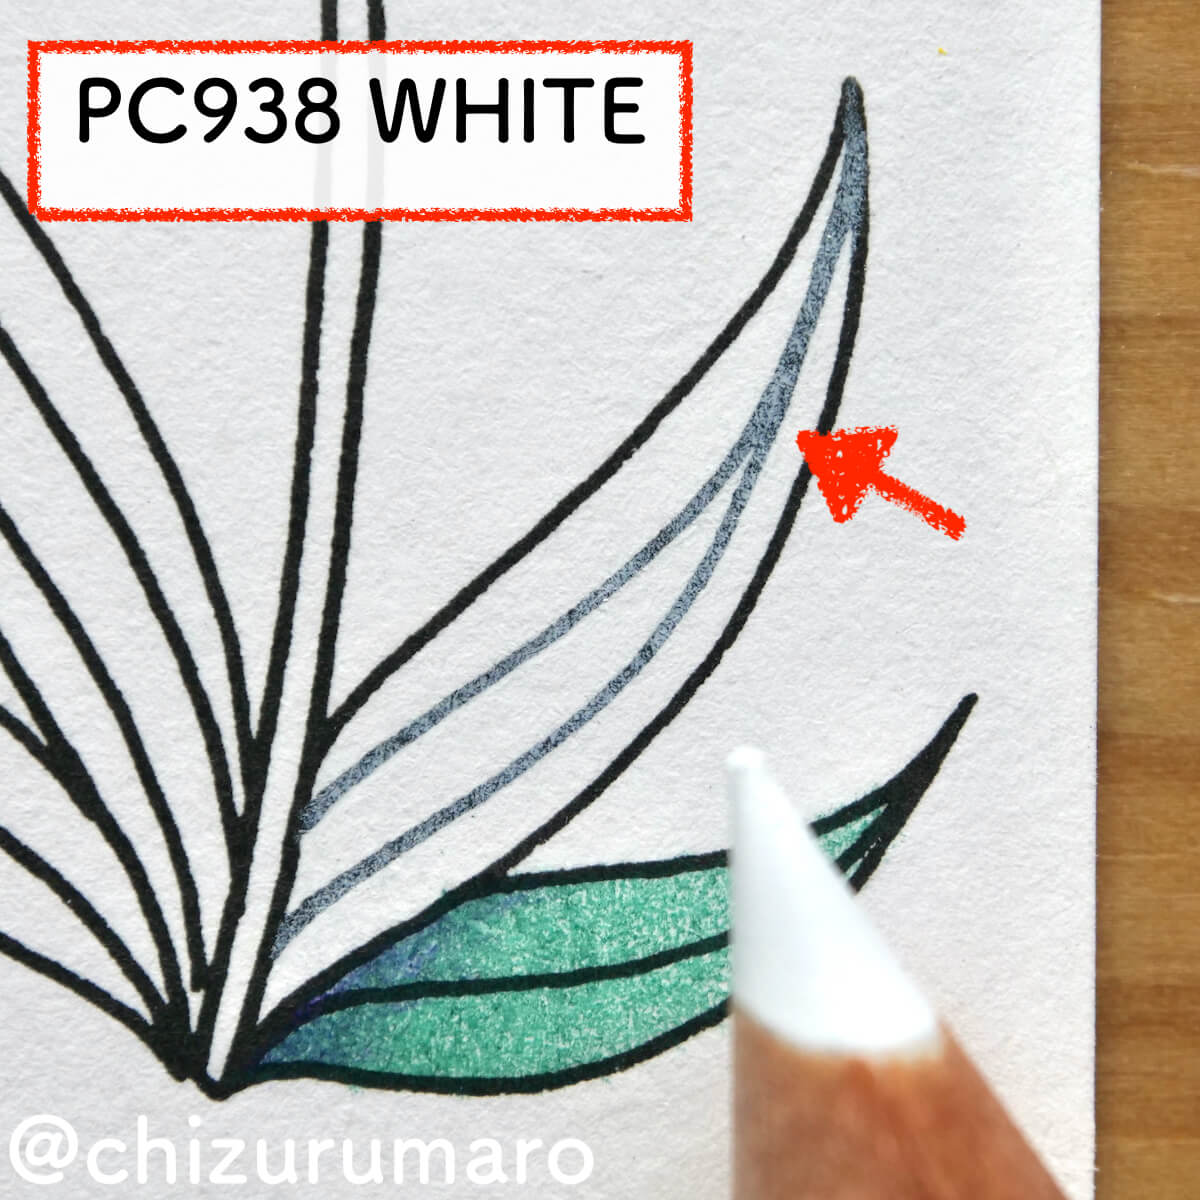 f:id:chizurumaro:20210819124101j:plain